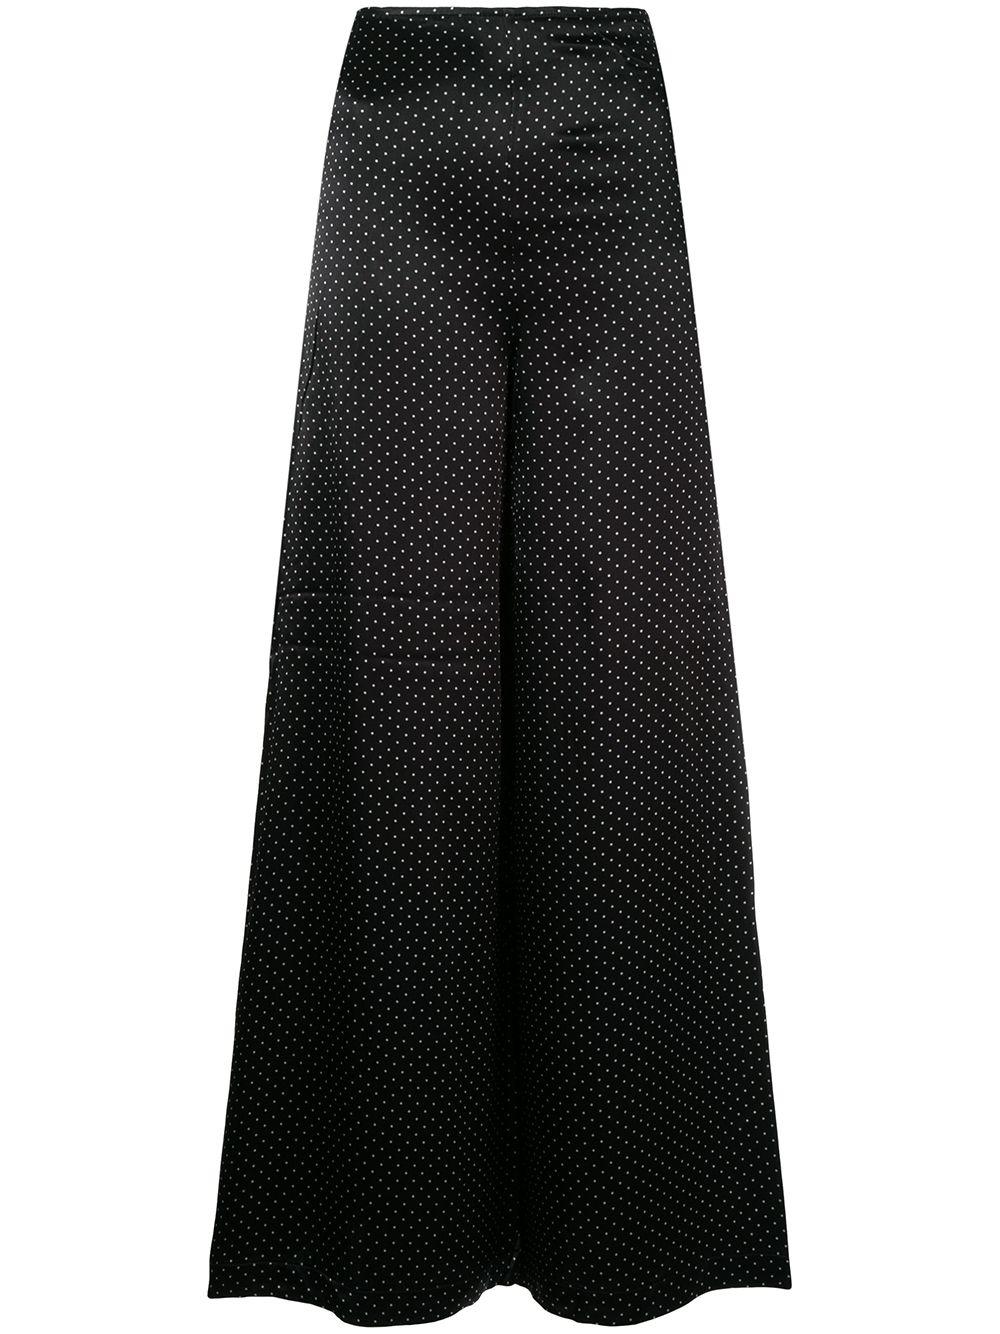 Ganni | брюки с широкими штанинами в горох | Clouty